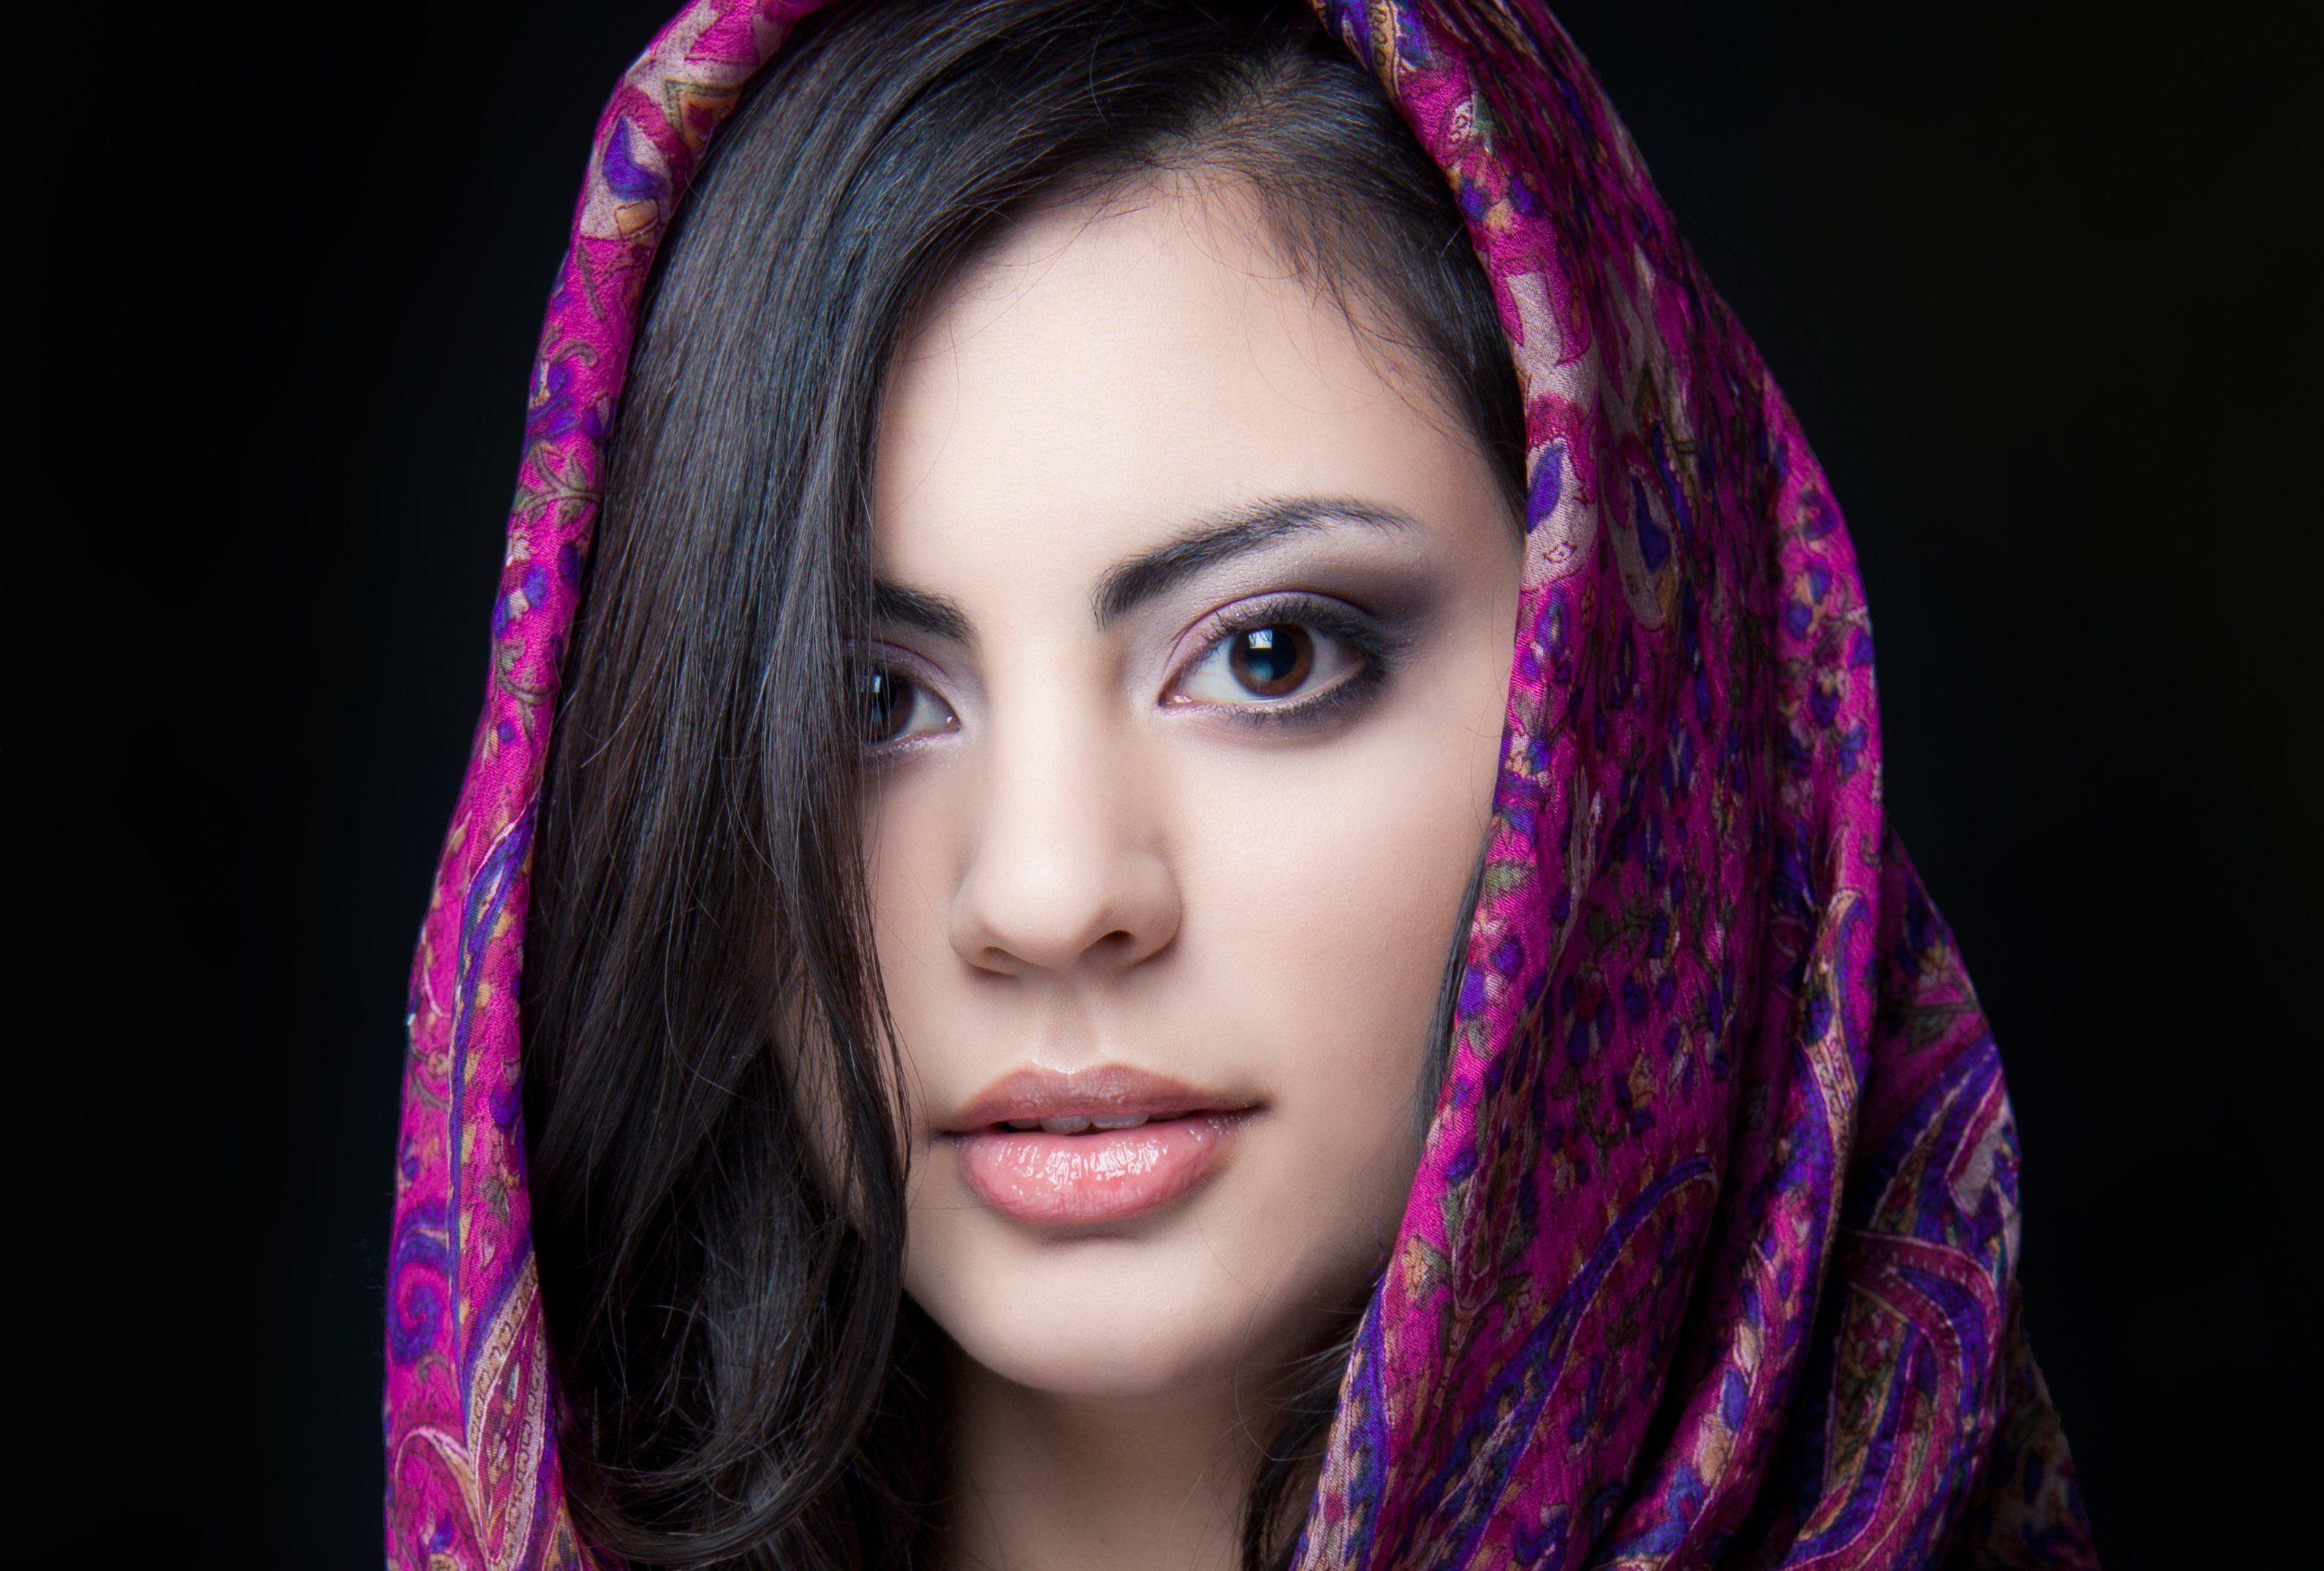 Indian Women Wallpapers Top Free Indian Women Backgrounds Wallpaperaccess